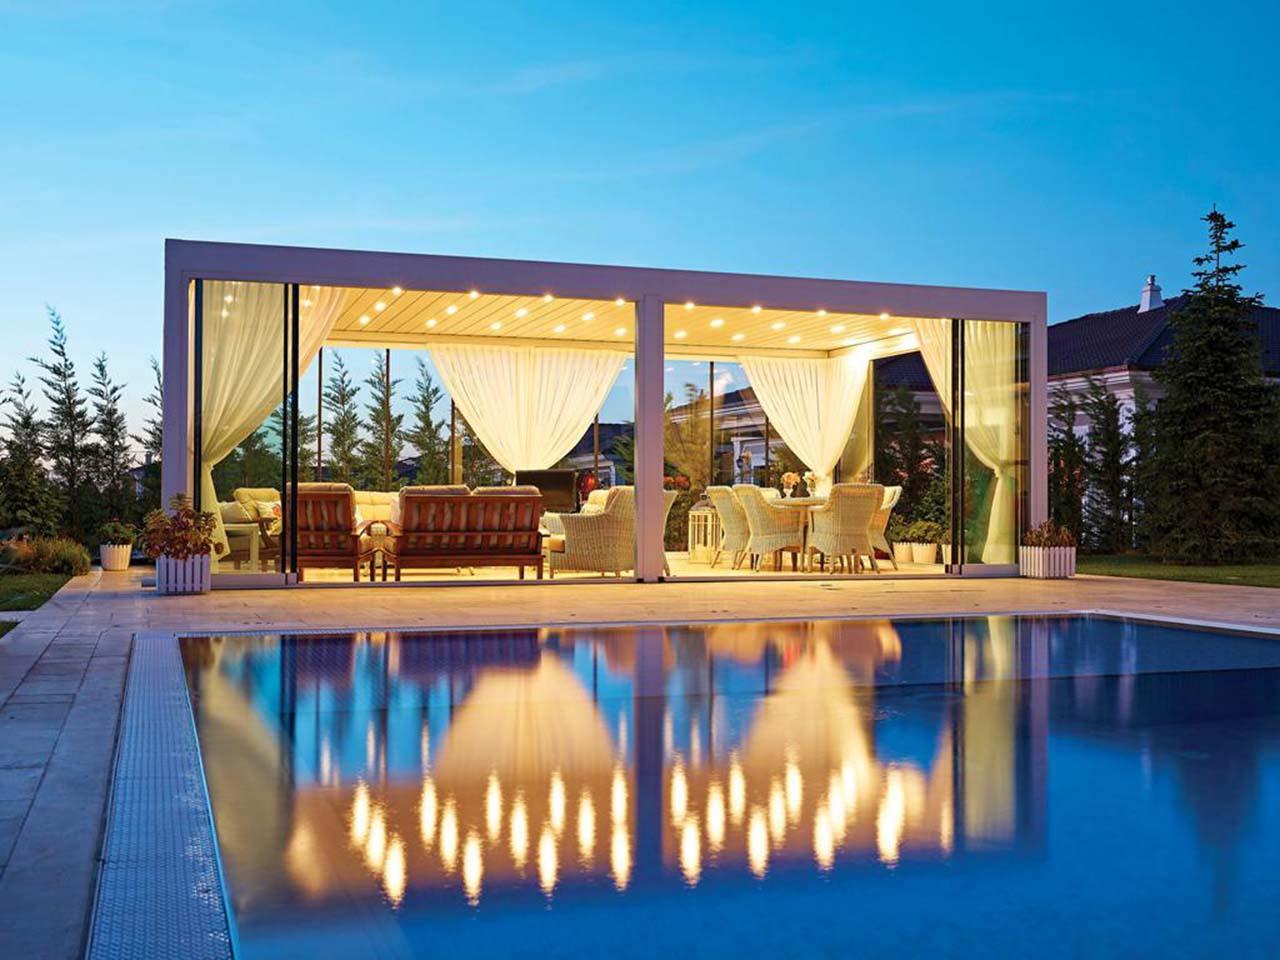 lamellendach skyroof palmiye terrassenueberdachung highlight 7 - Lamellendach Skyroof